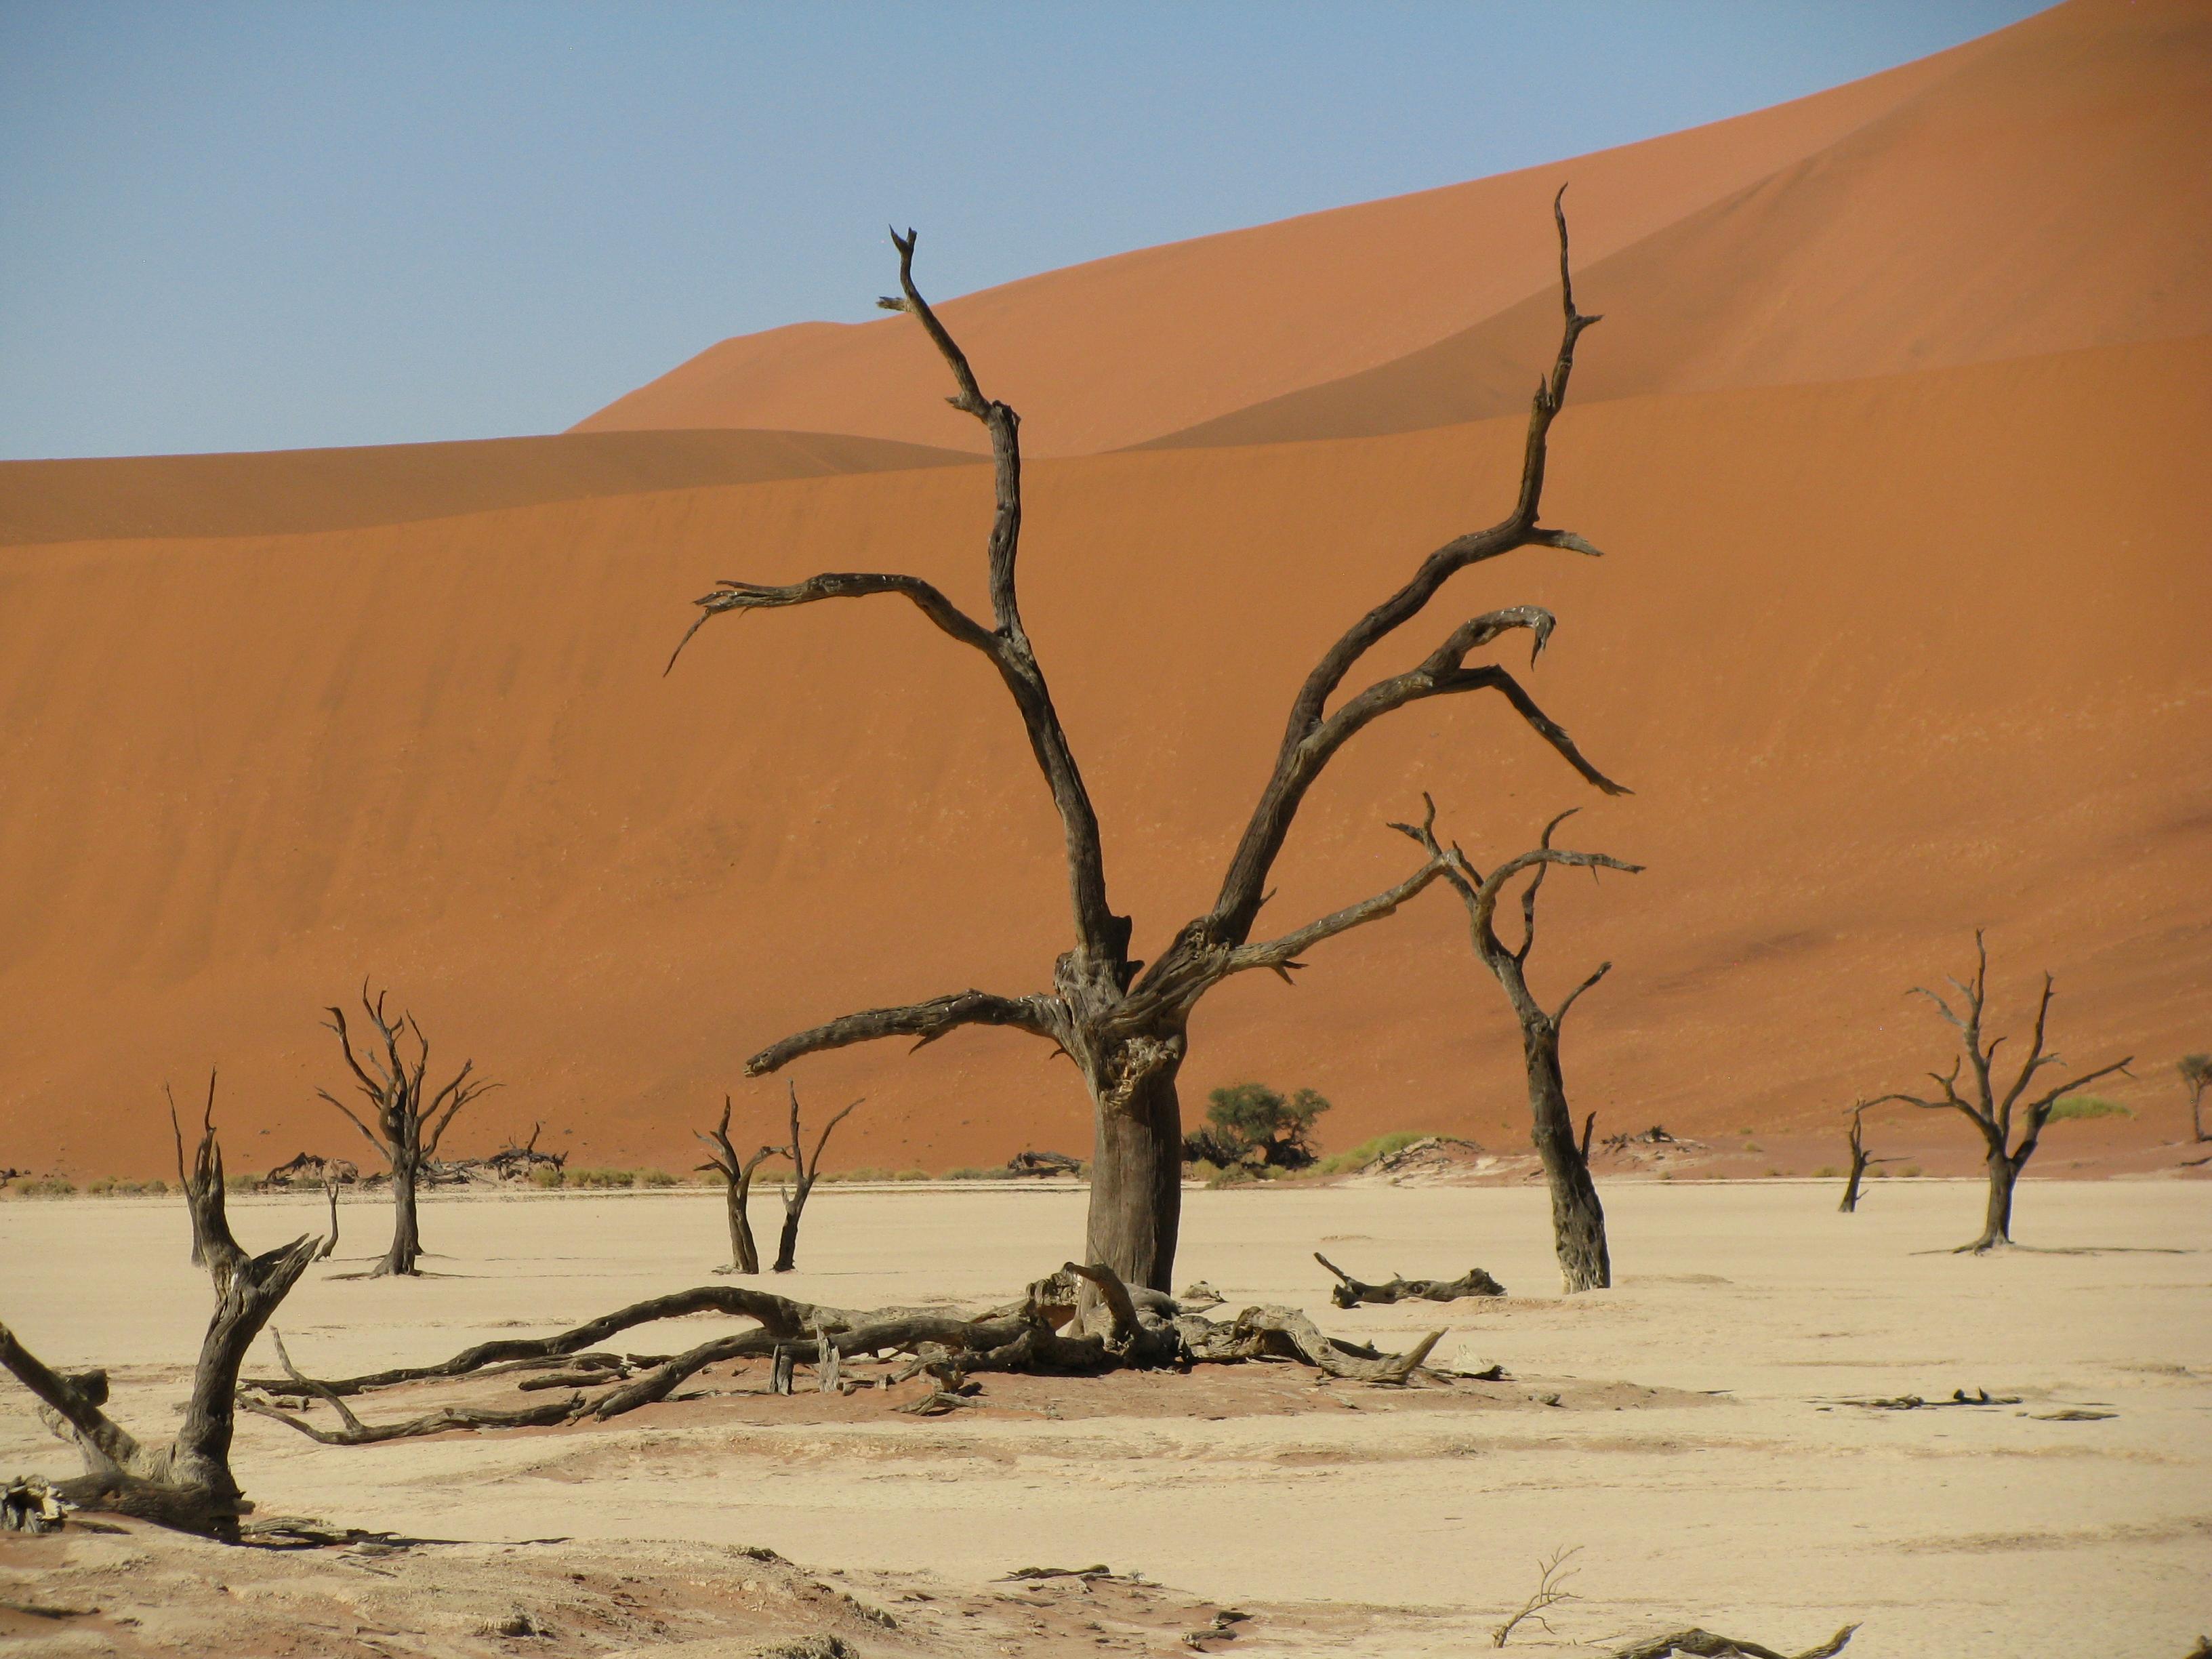 Sossuslvei, Namibia